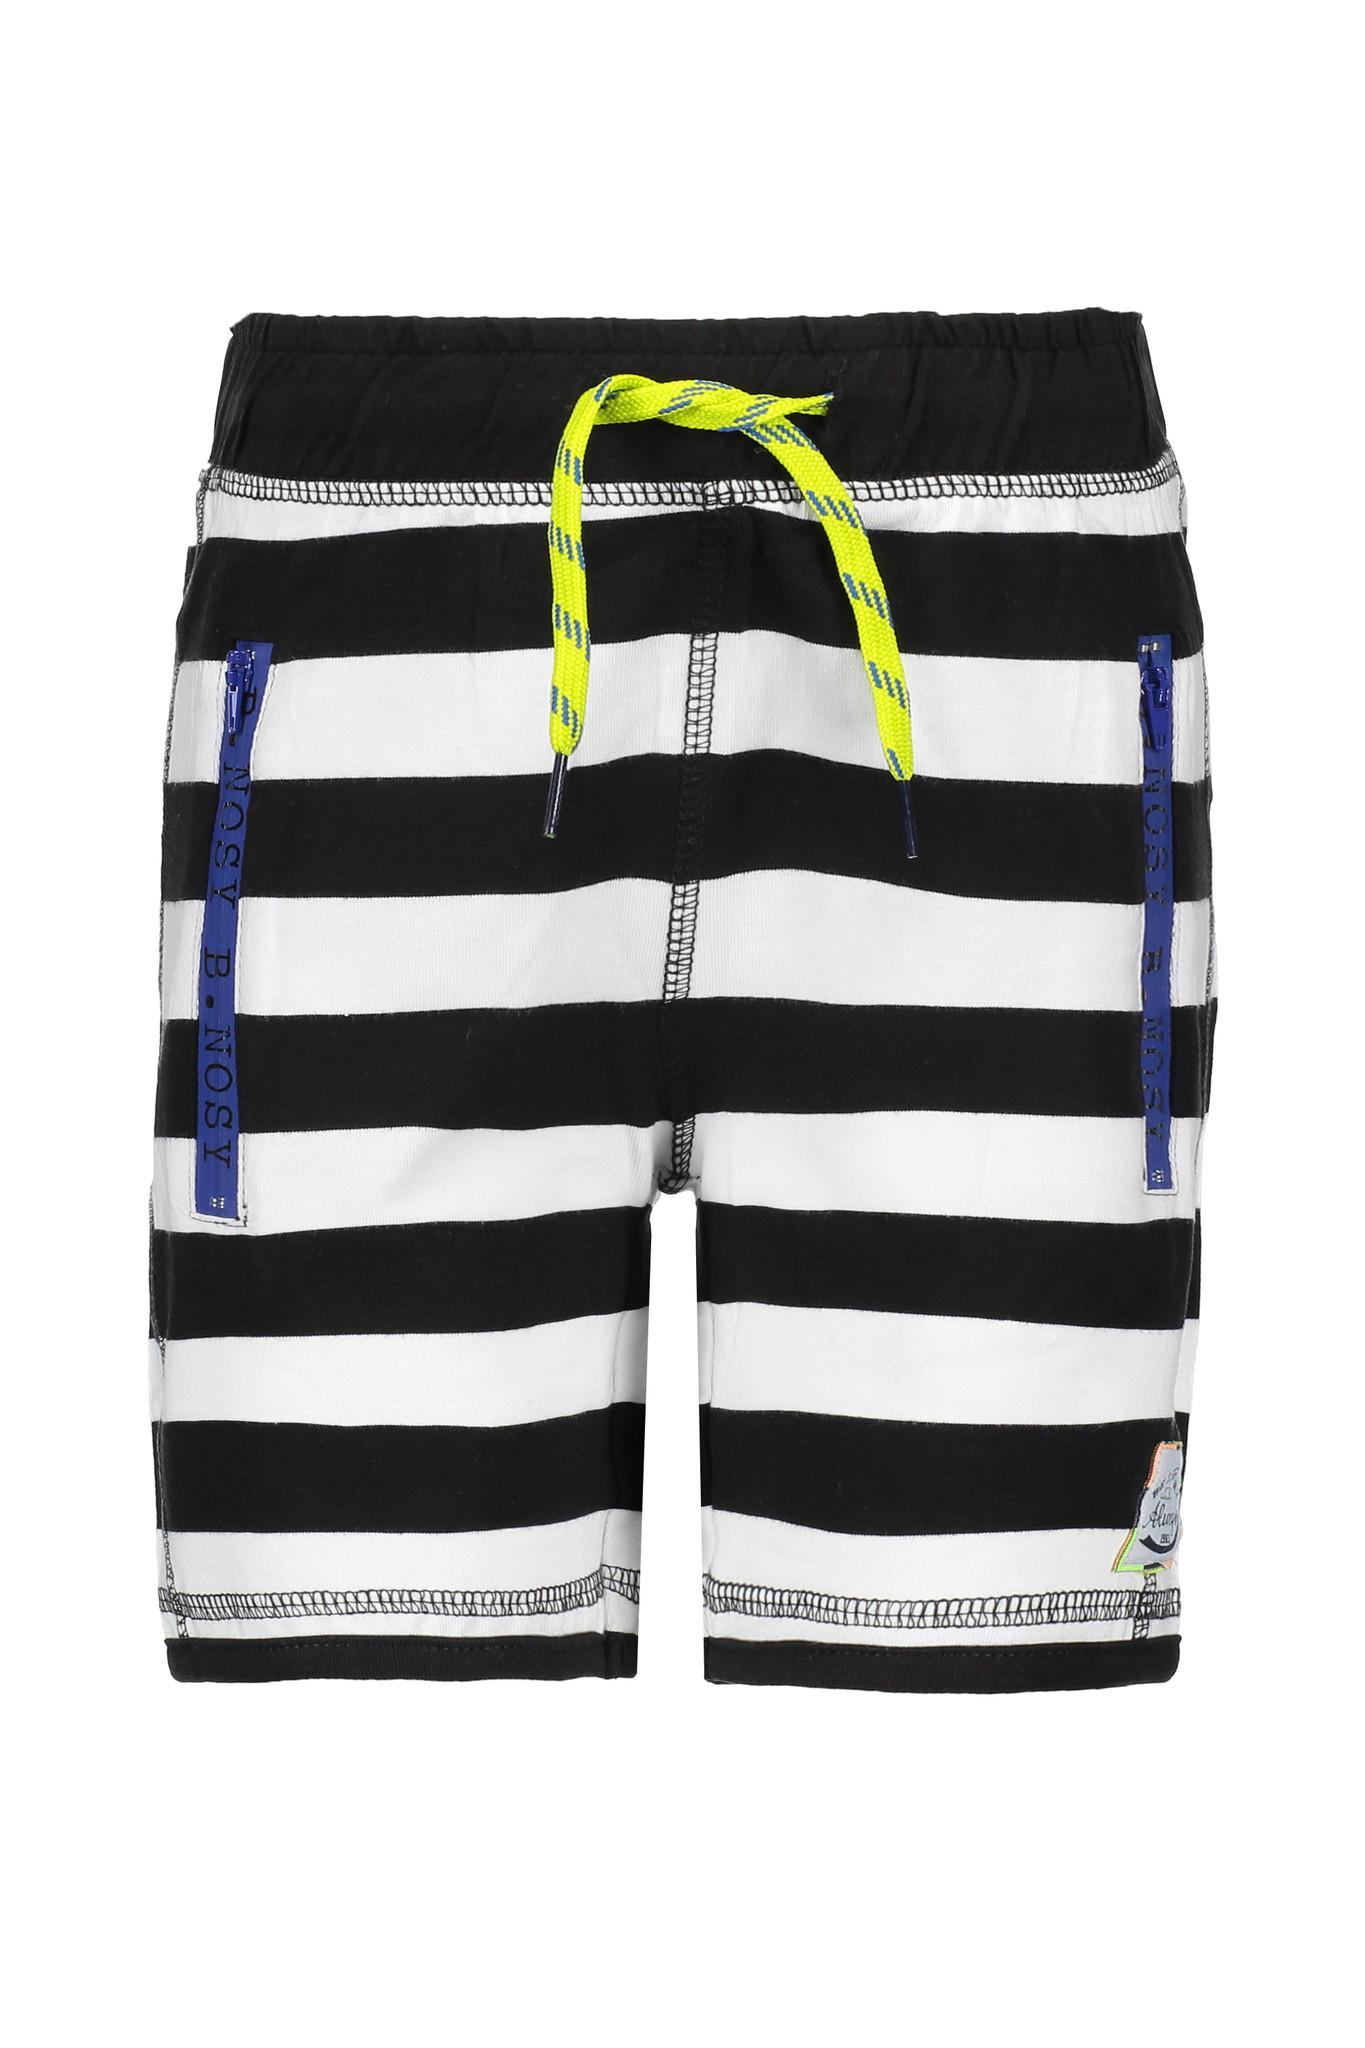 B.Nosy B.Nosy short with elasticated waistband y/d black- chalk white